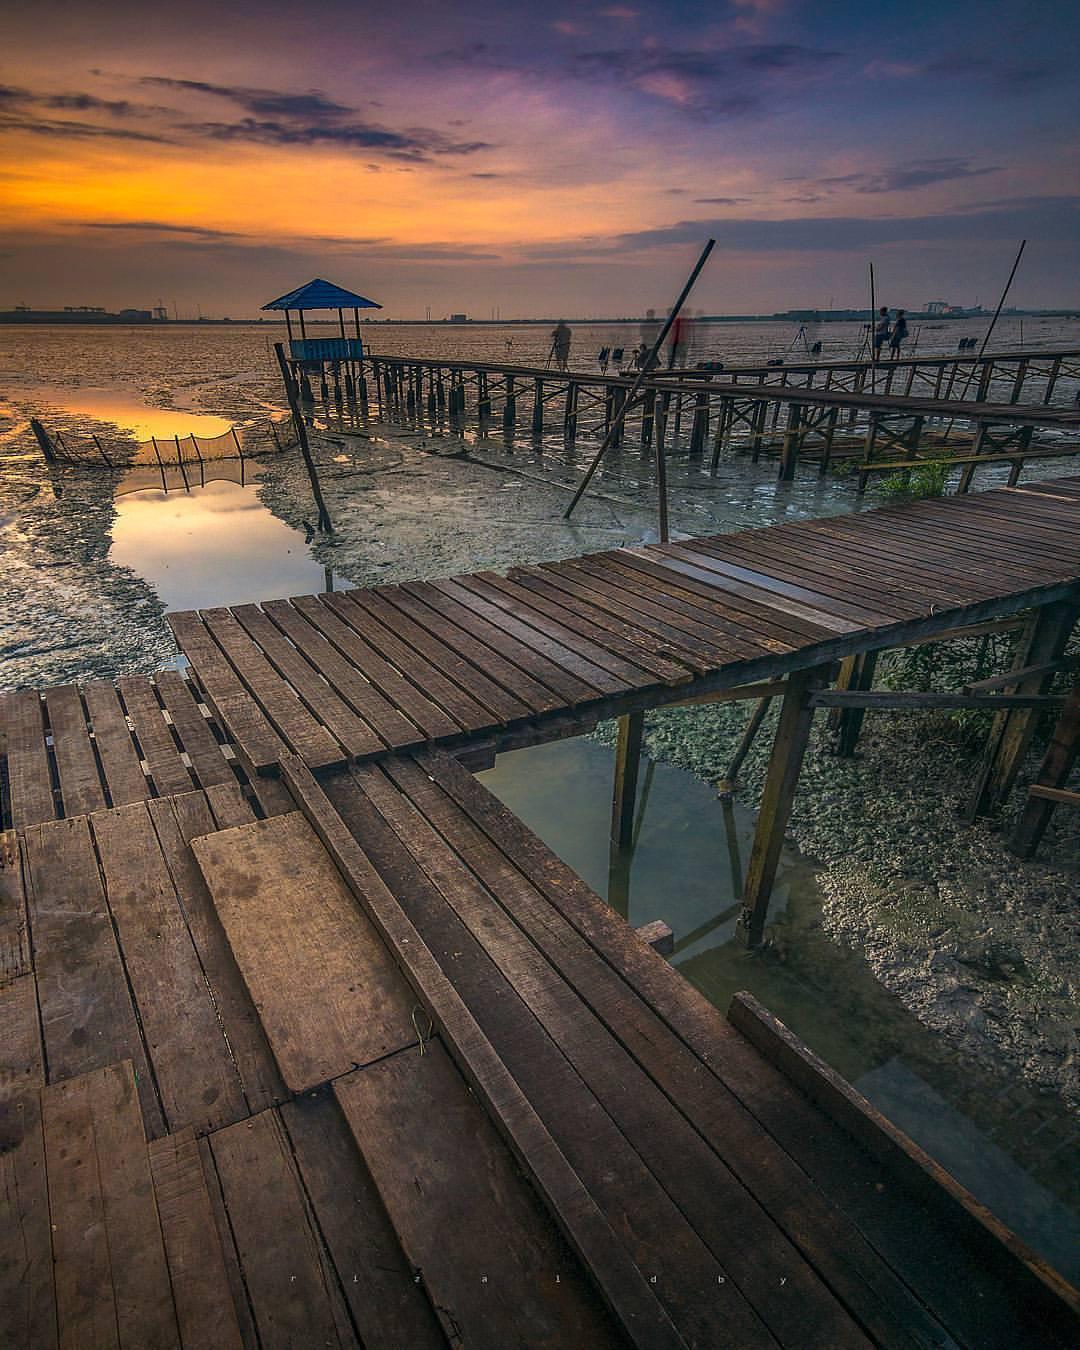 Tempat Wisata Di Gresik : tempat, wisata, gresik, Tempat, Wisata, Gresik, Murah, Indonesia